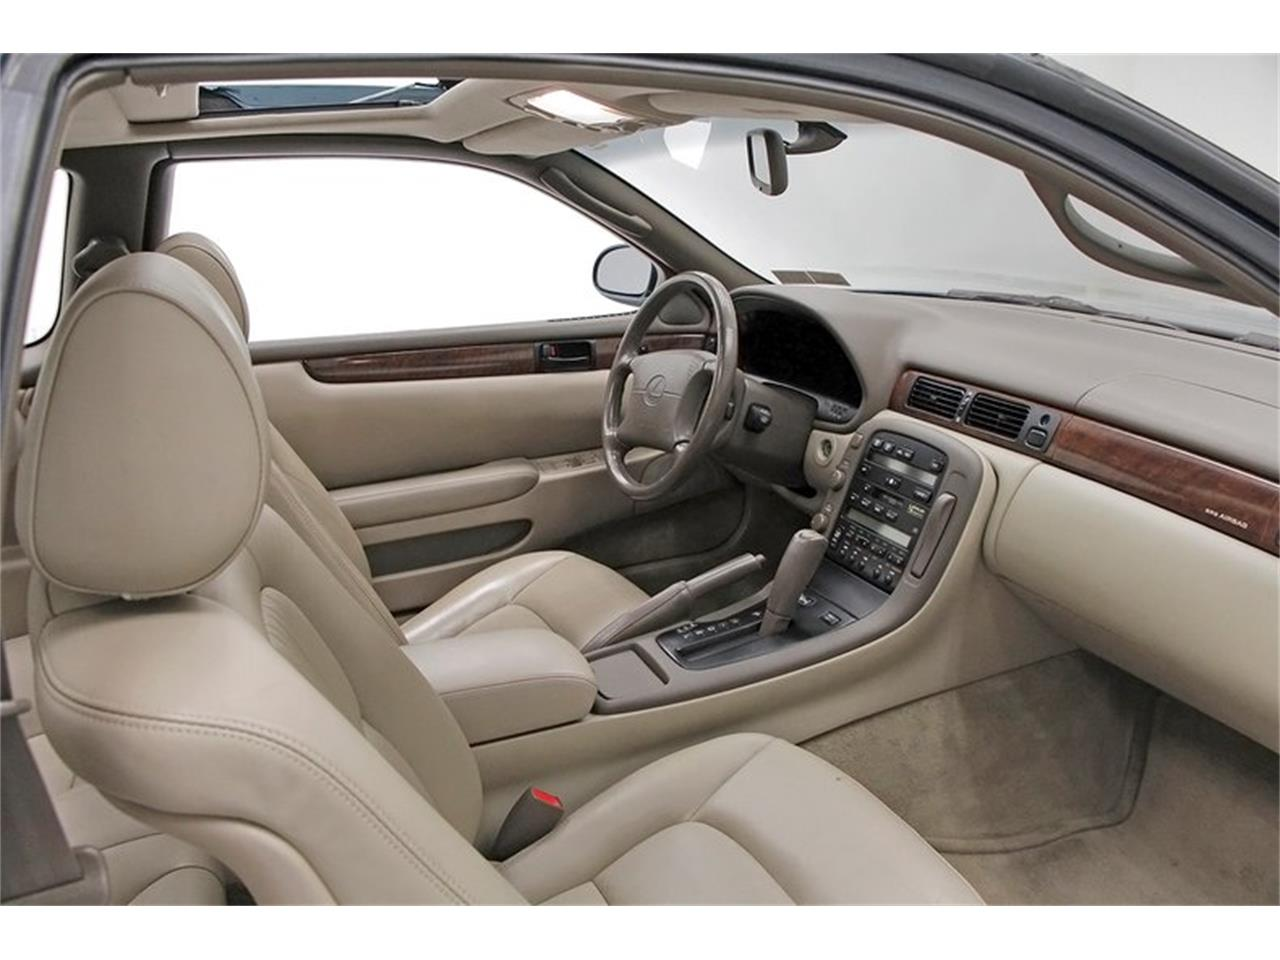 1995 Lexus SC400 (CC-1209189) for sale in Morgantown, Pennsylvania